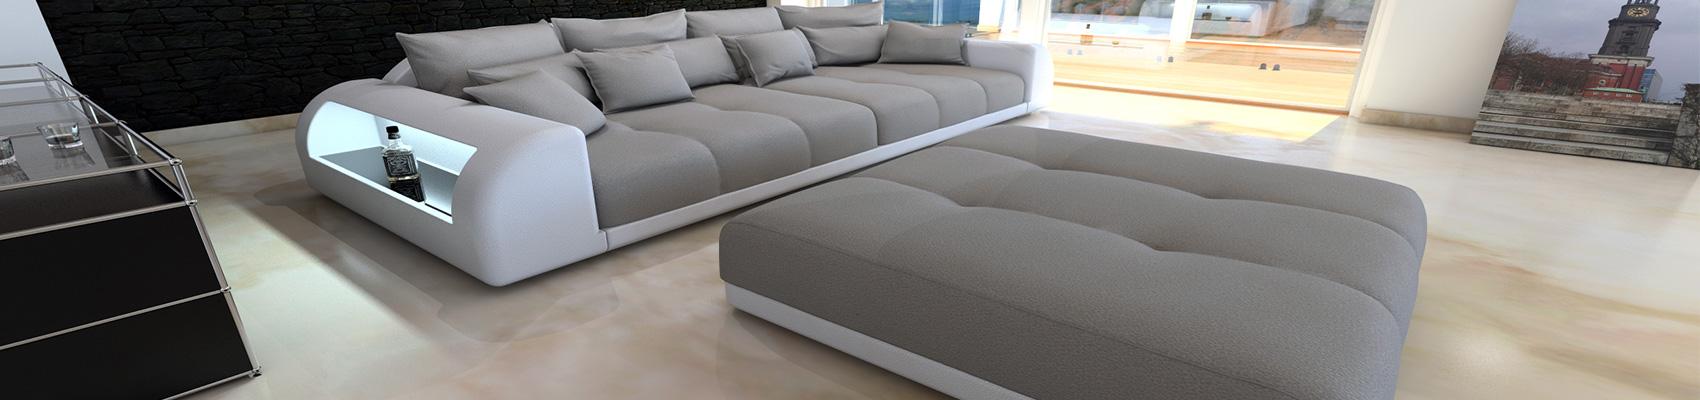 Små stof Sektions sofaer